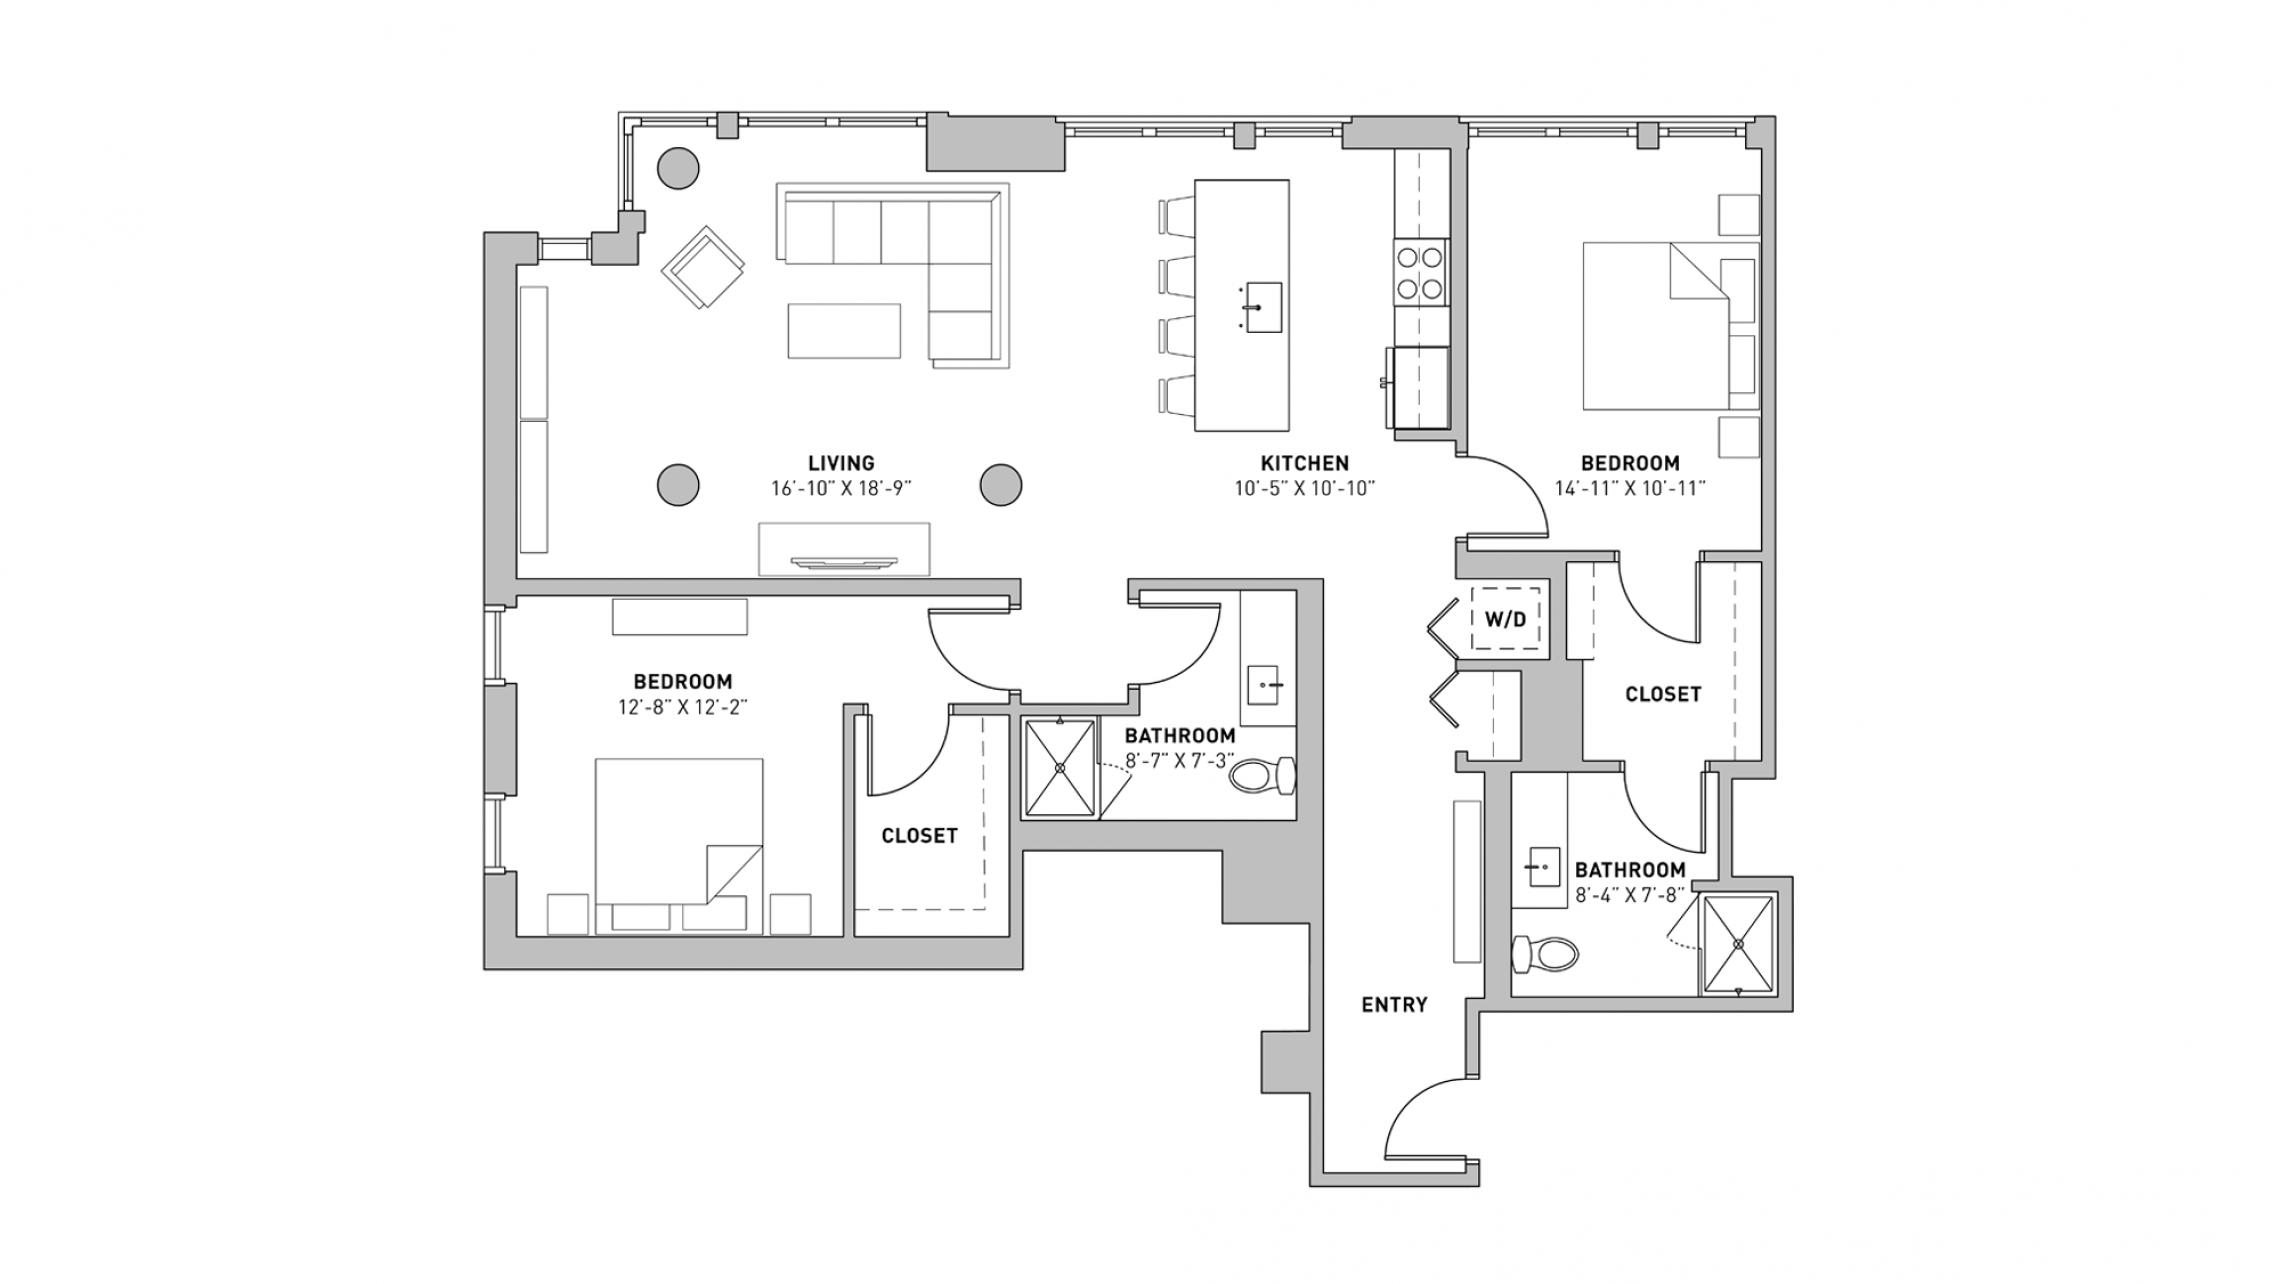 ULI The Pressman 501 - Two Bedroom, Two Bathroom